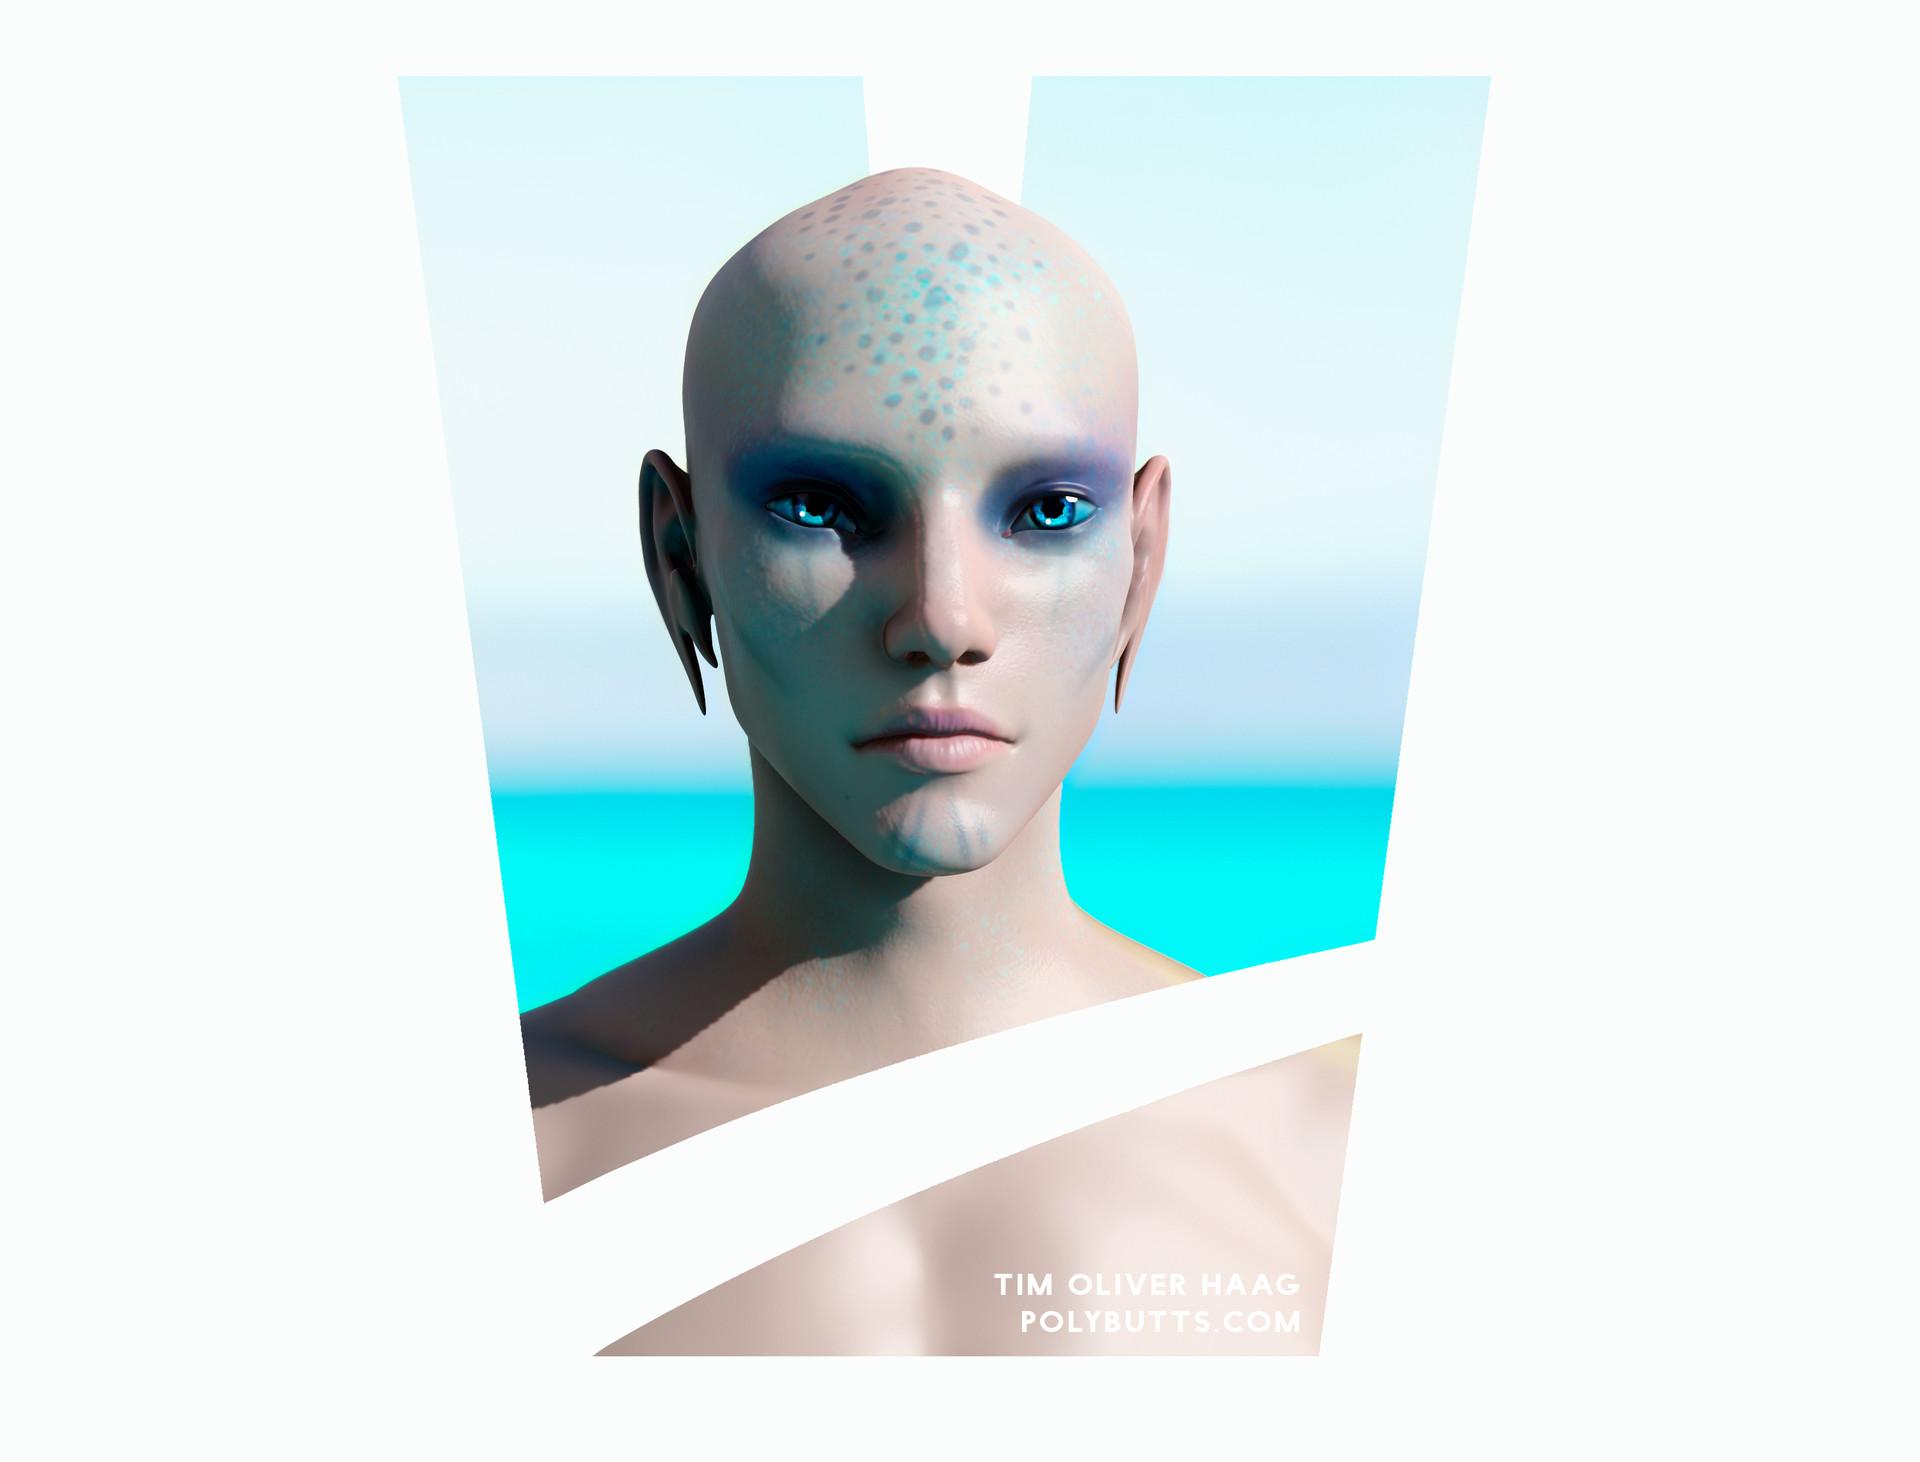 Tim oliver haag pearl 01